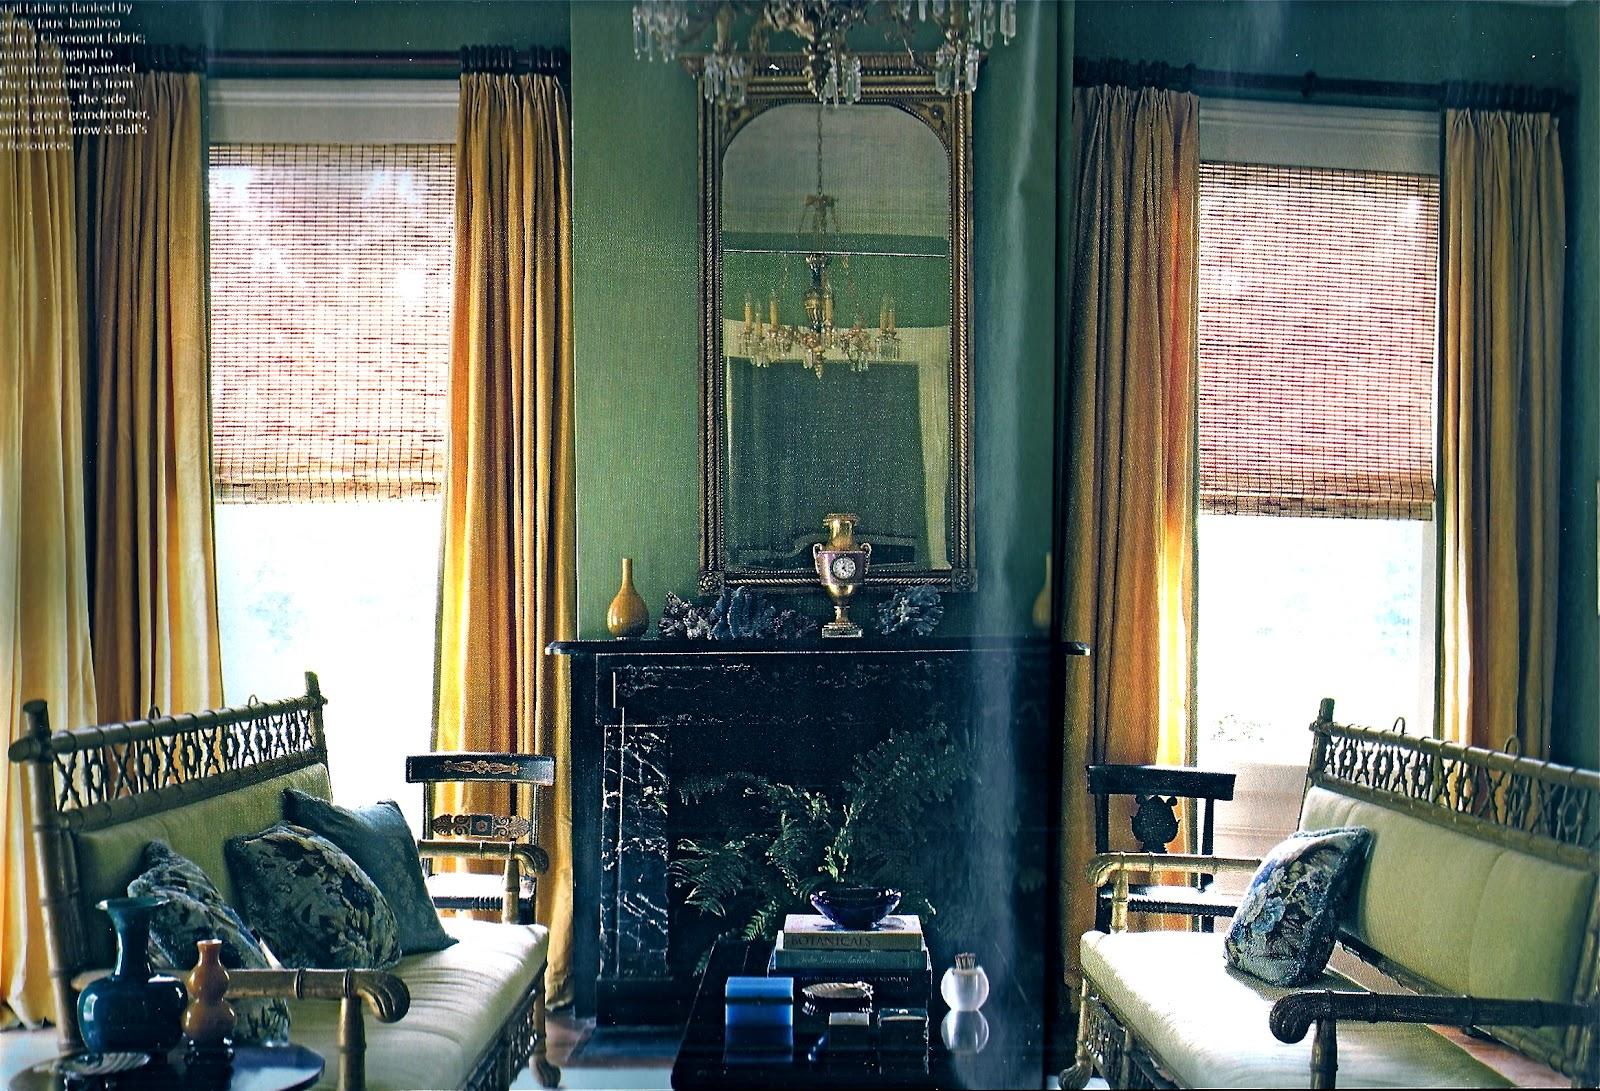 T h e  V i s u a l  V a m p  New Orleans Home Featured In Elle Decor